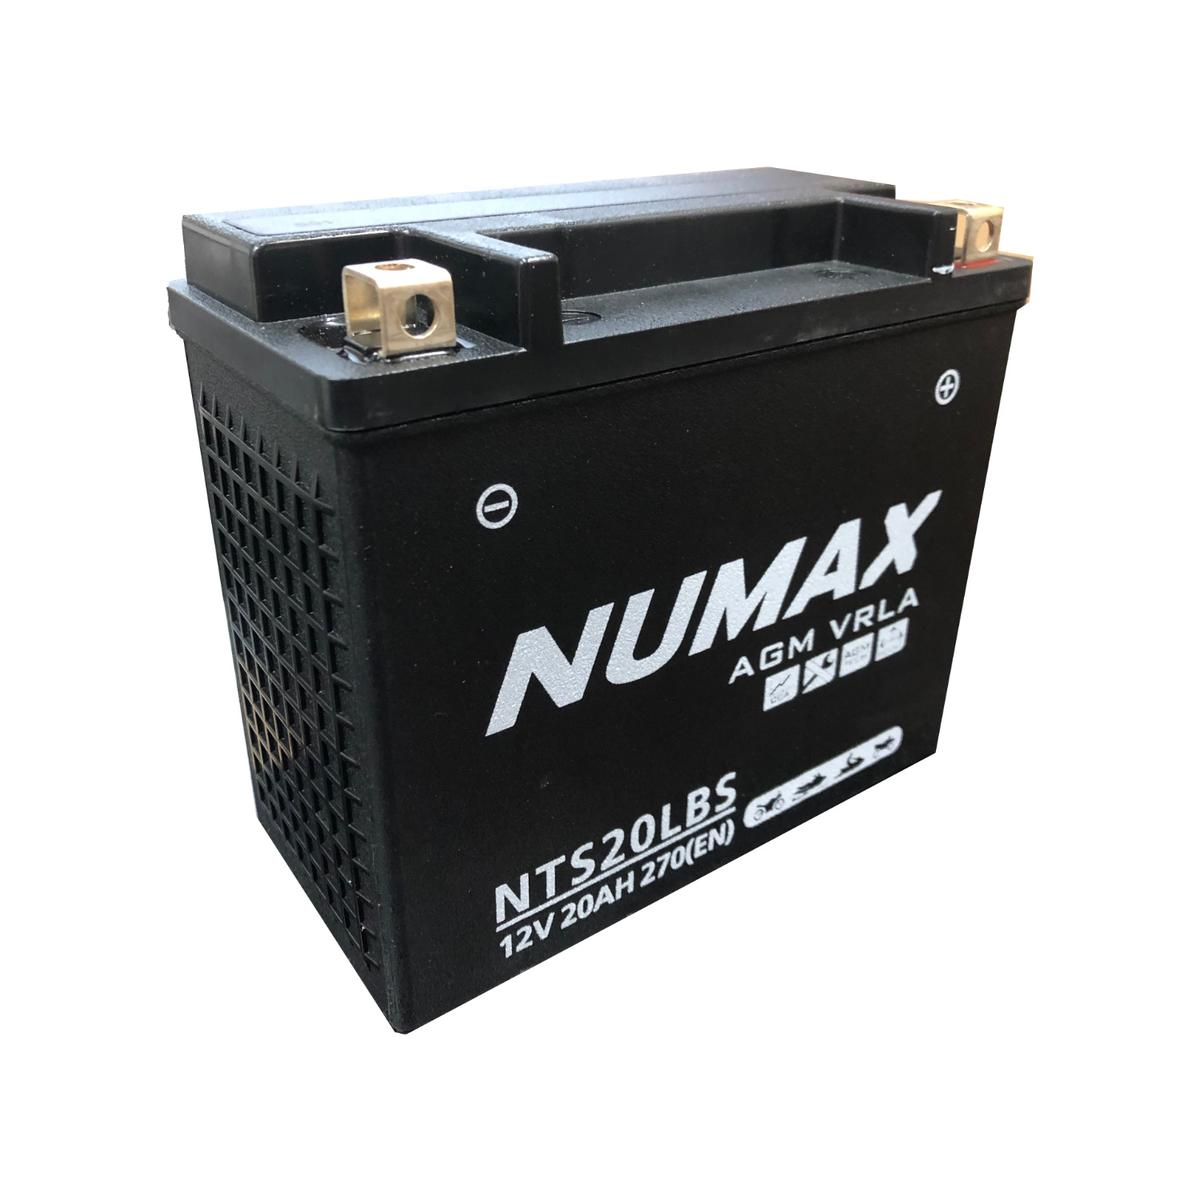 Numax NTS20LBS Motorbike Motorcycle Battery KAWASAKI 1100cc KZ1000 YTX20L-4